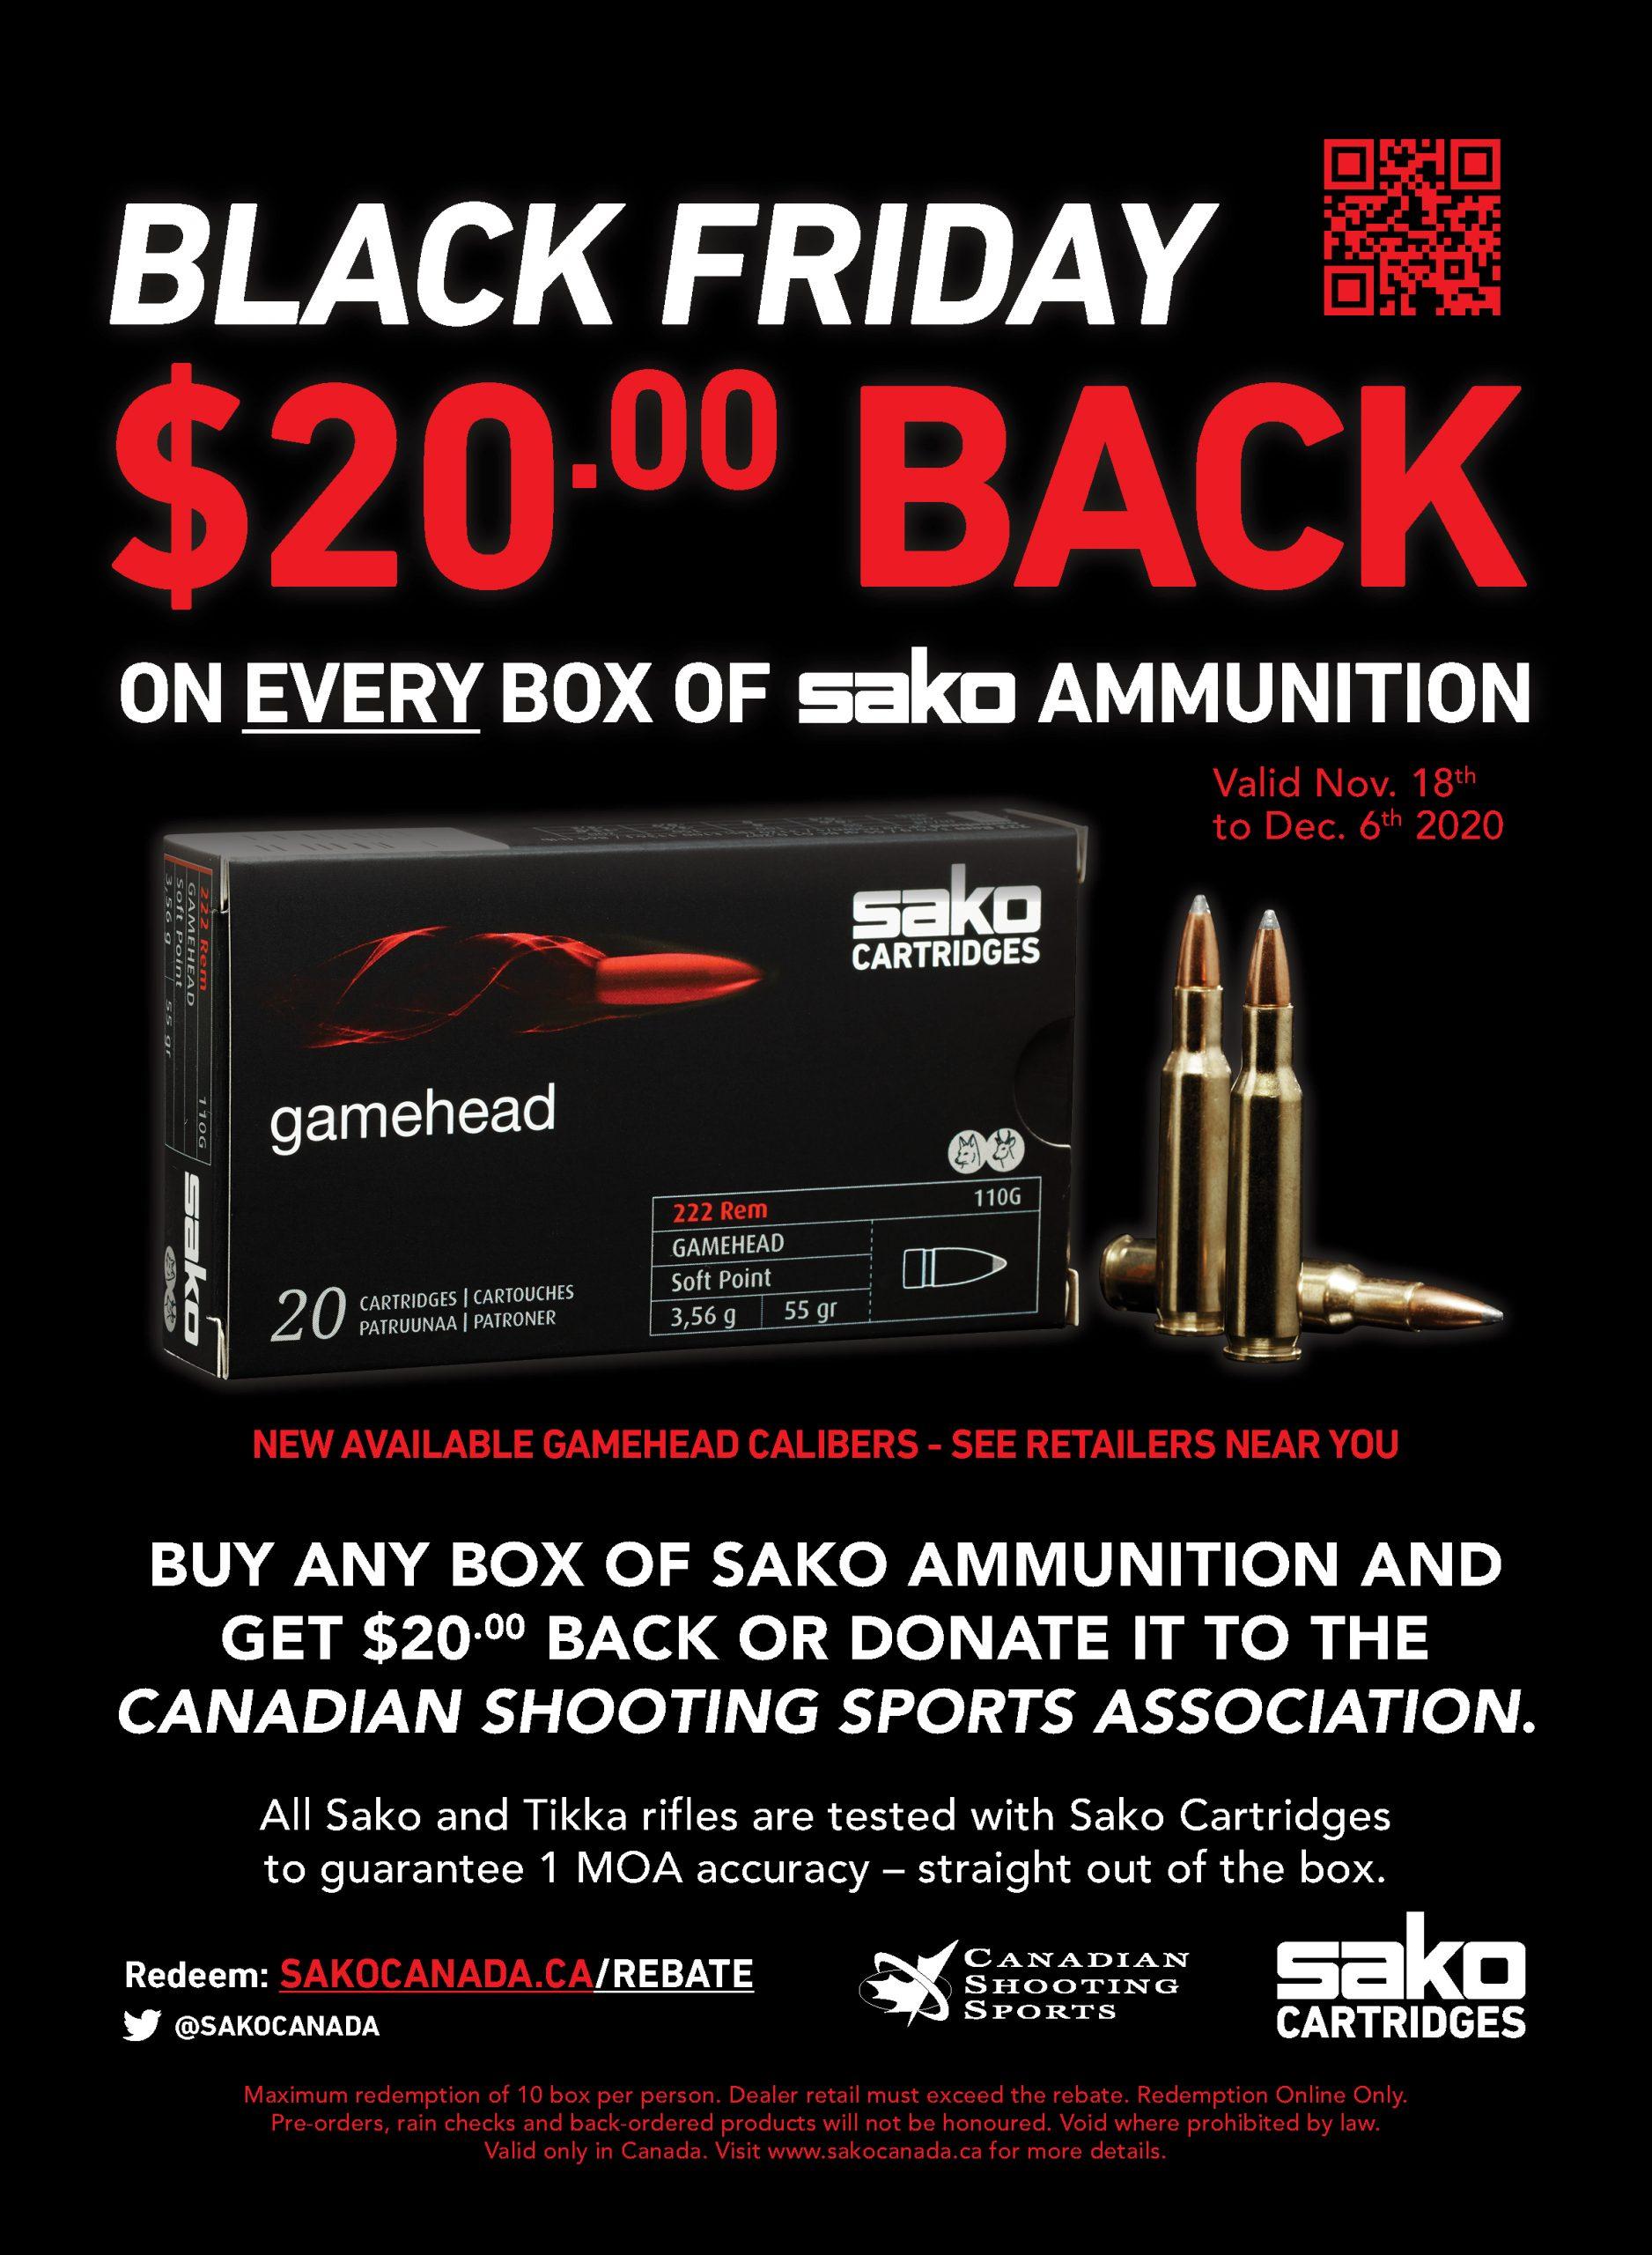 Sako Ammo Black Friday Promotional Poster 2020 20 Rebate